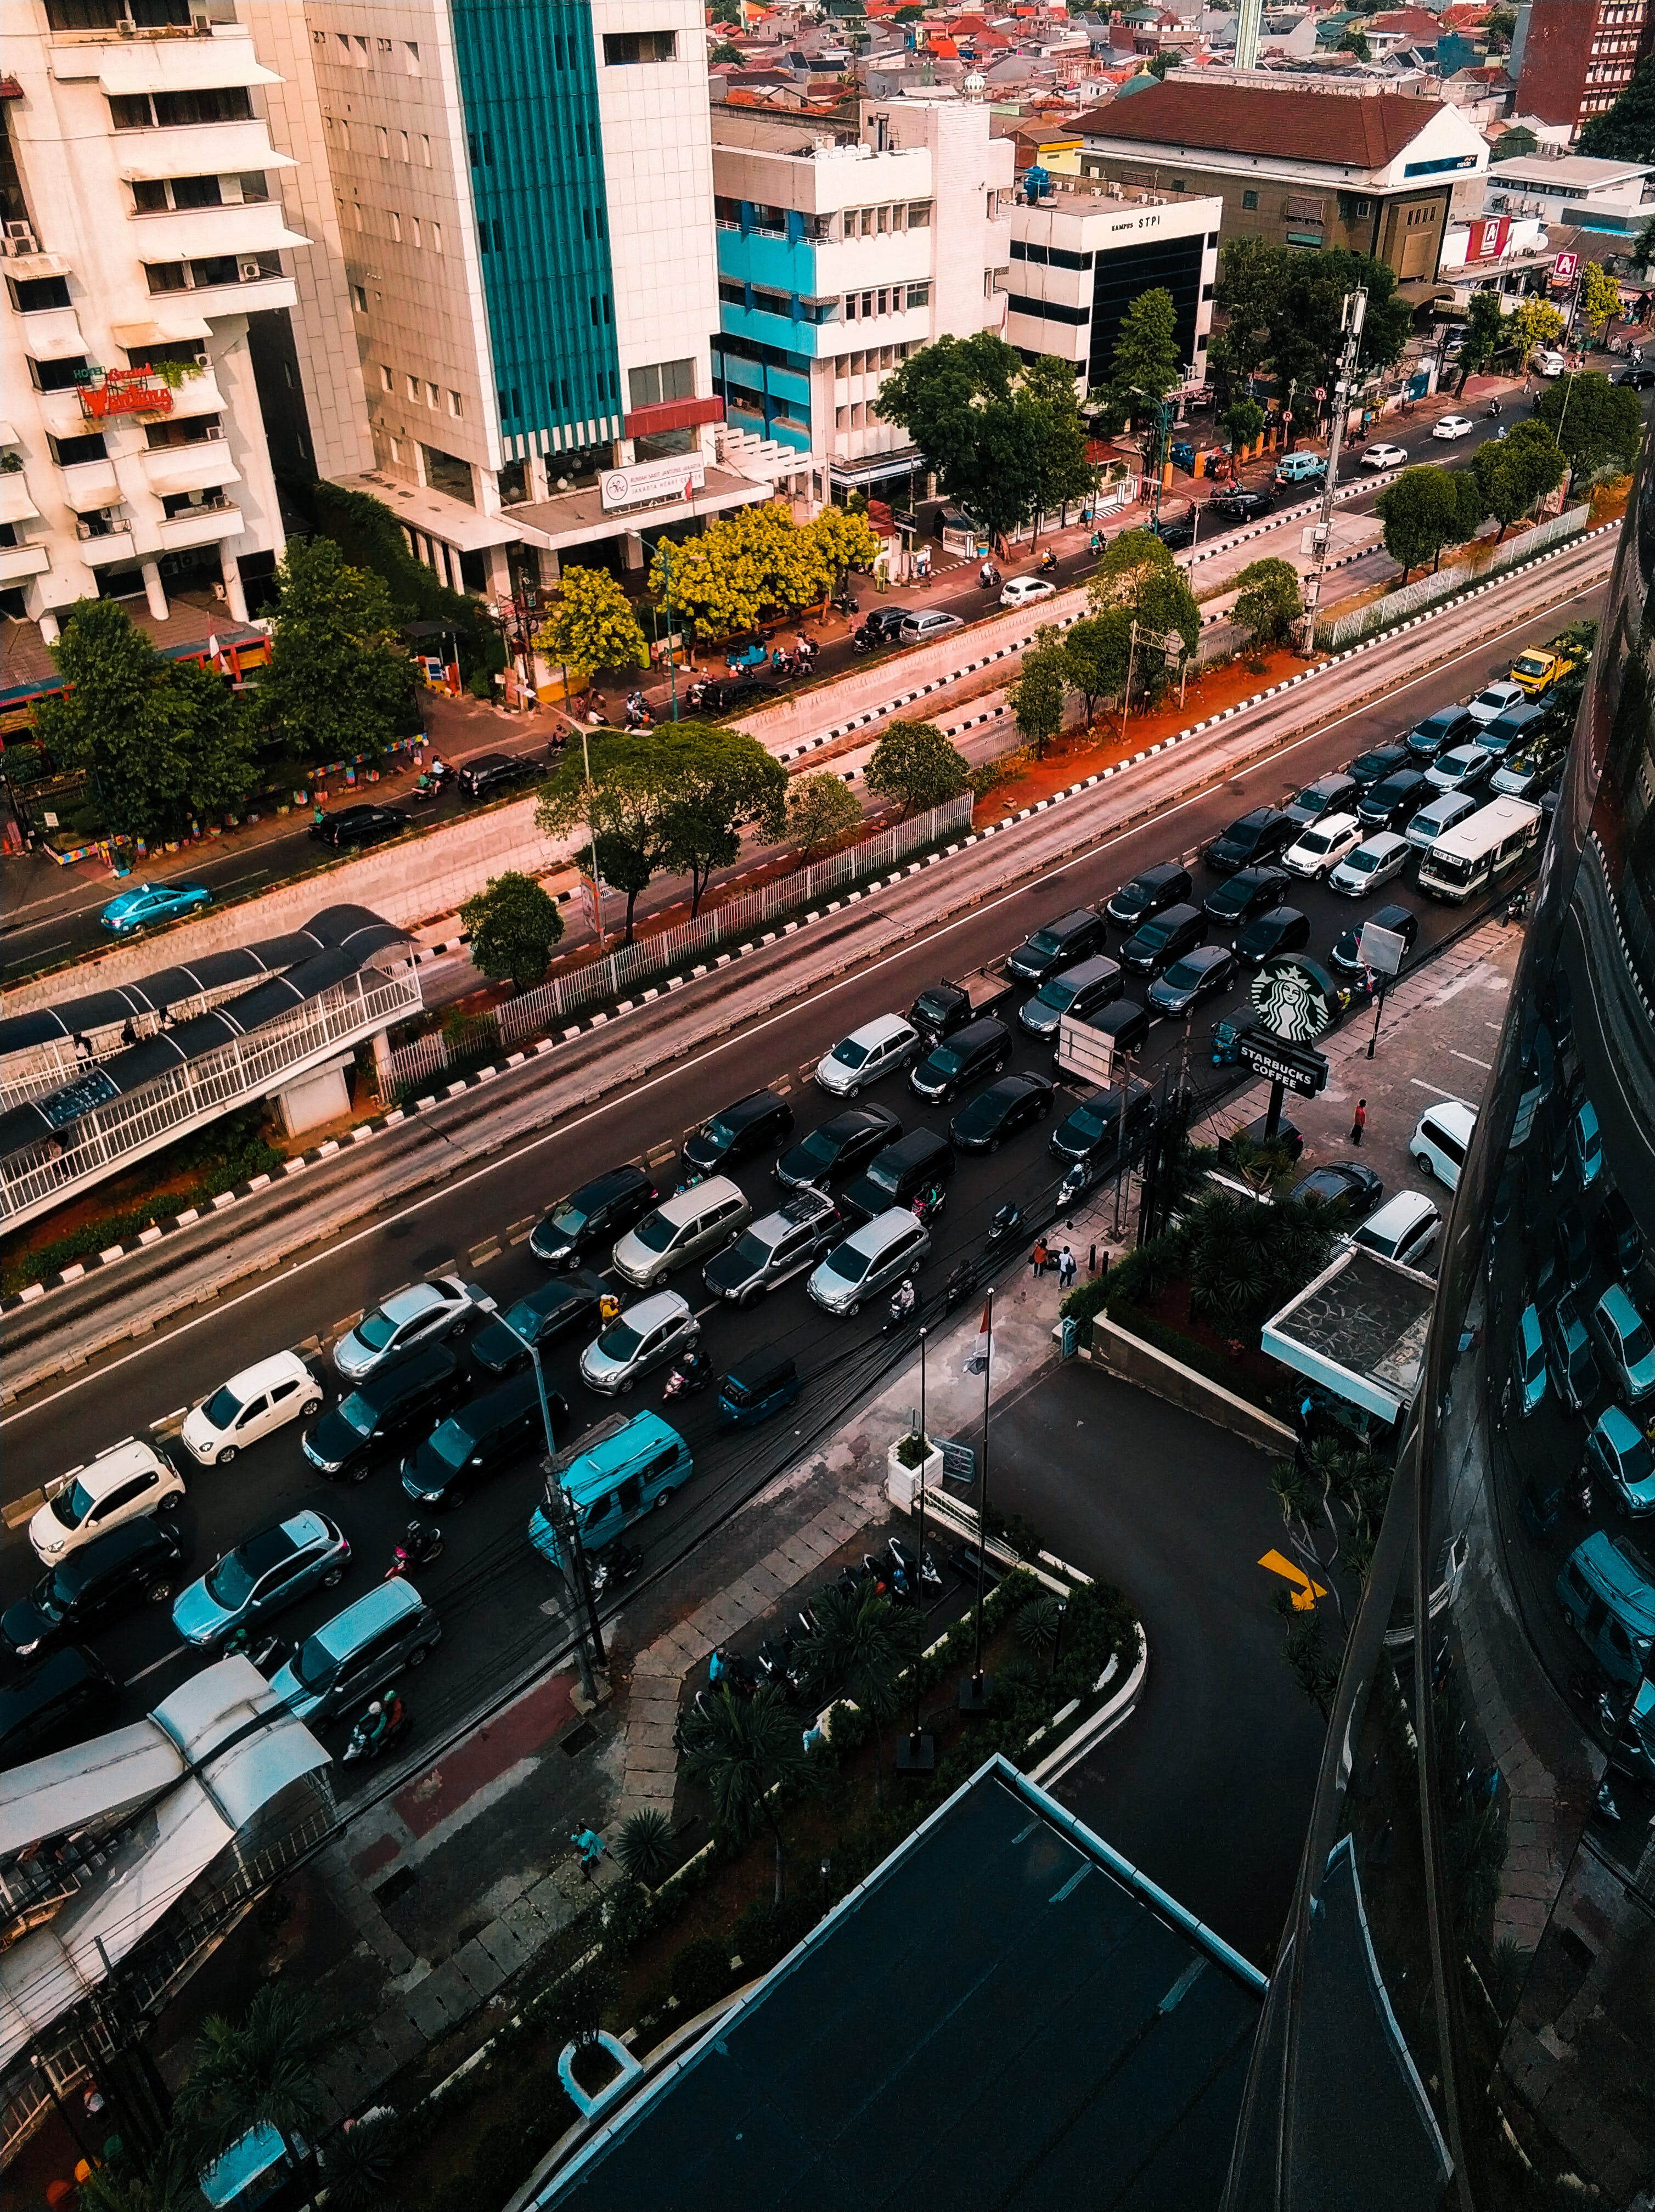 Bird's-eye View Photo of Vehicles on Roadway